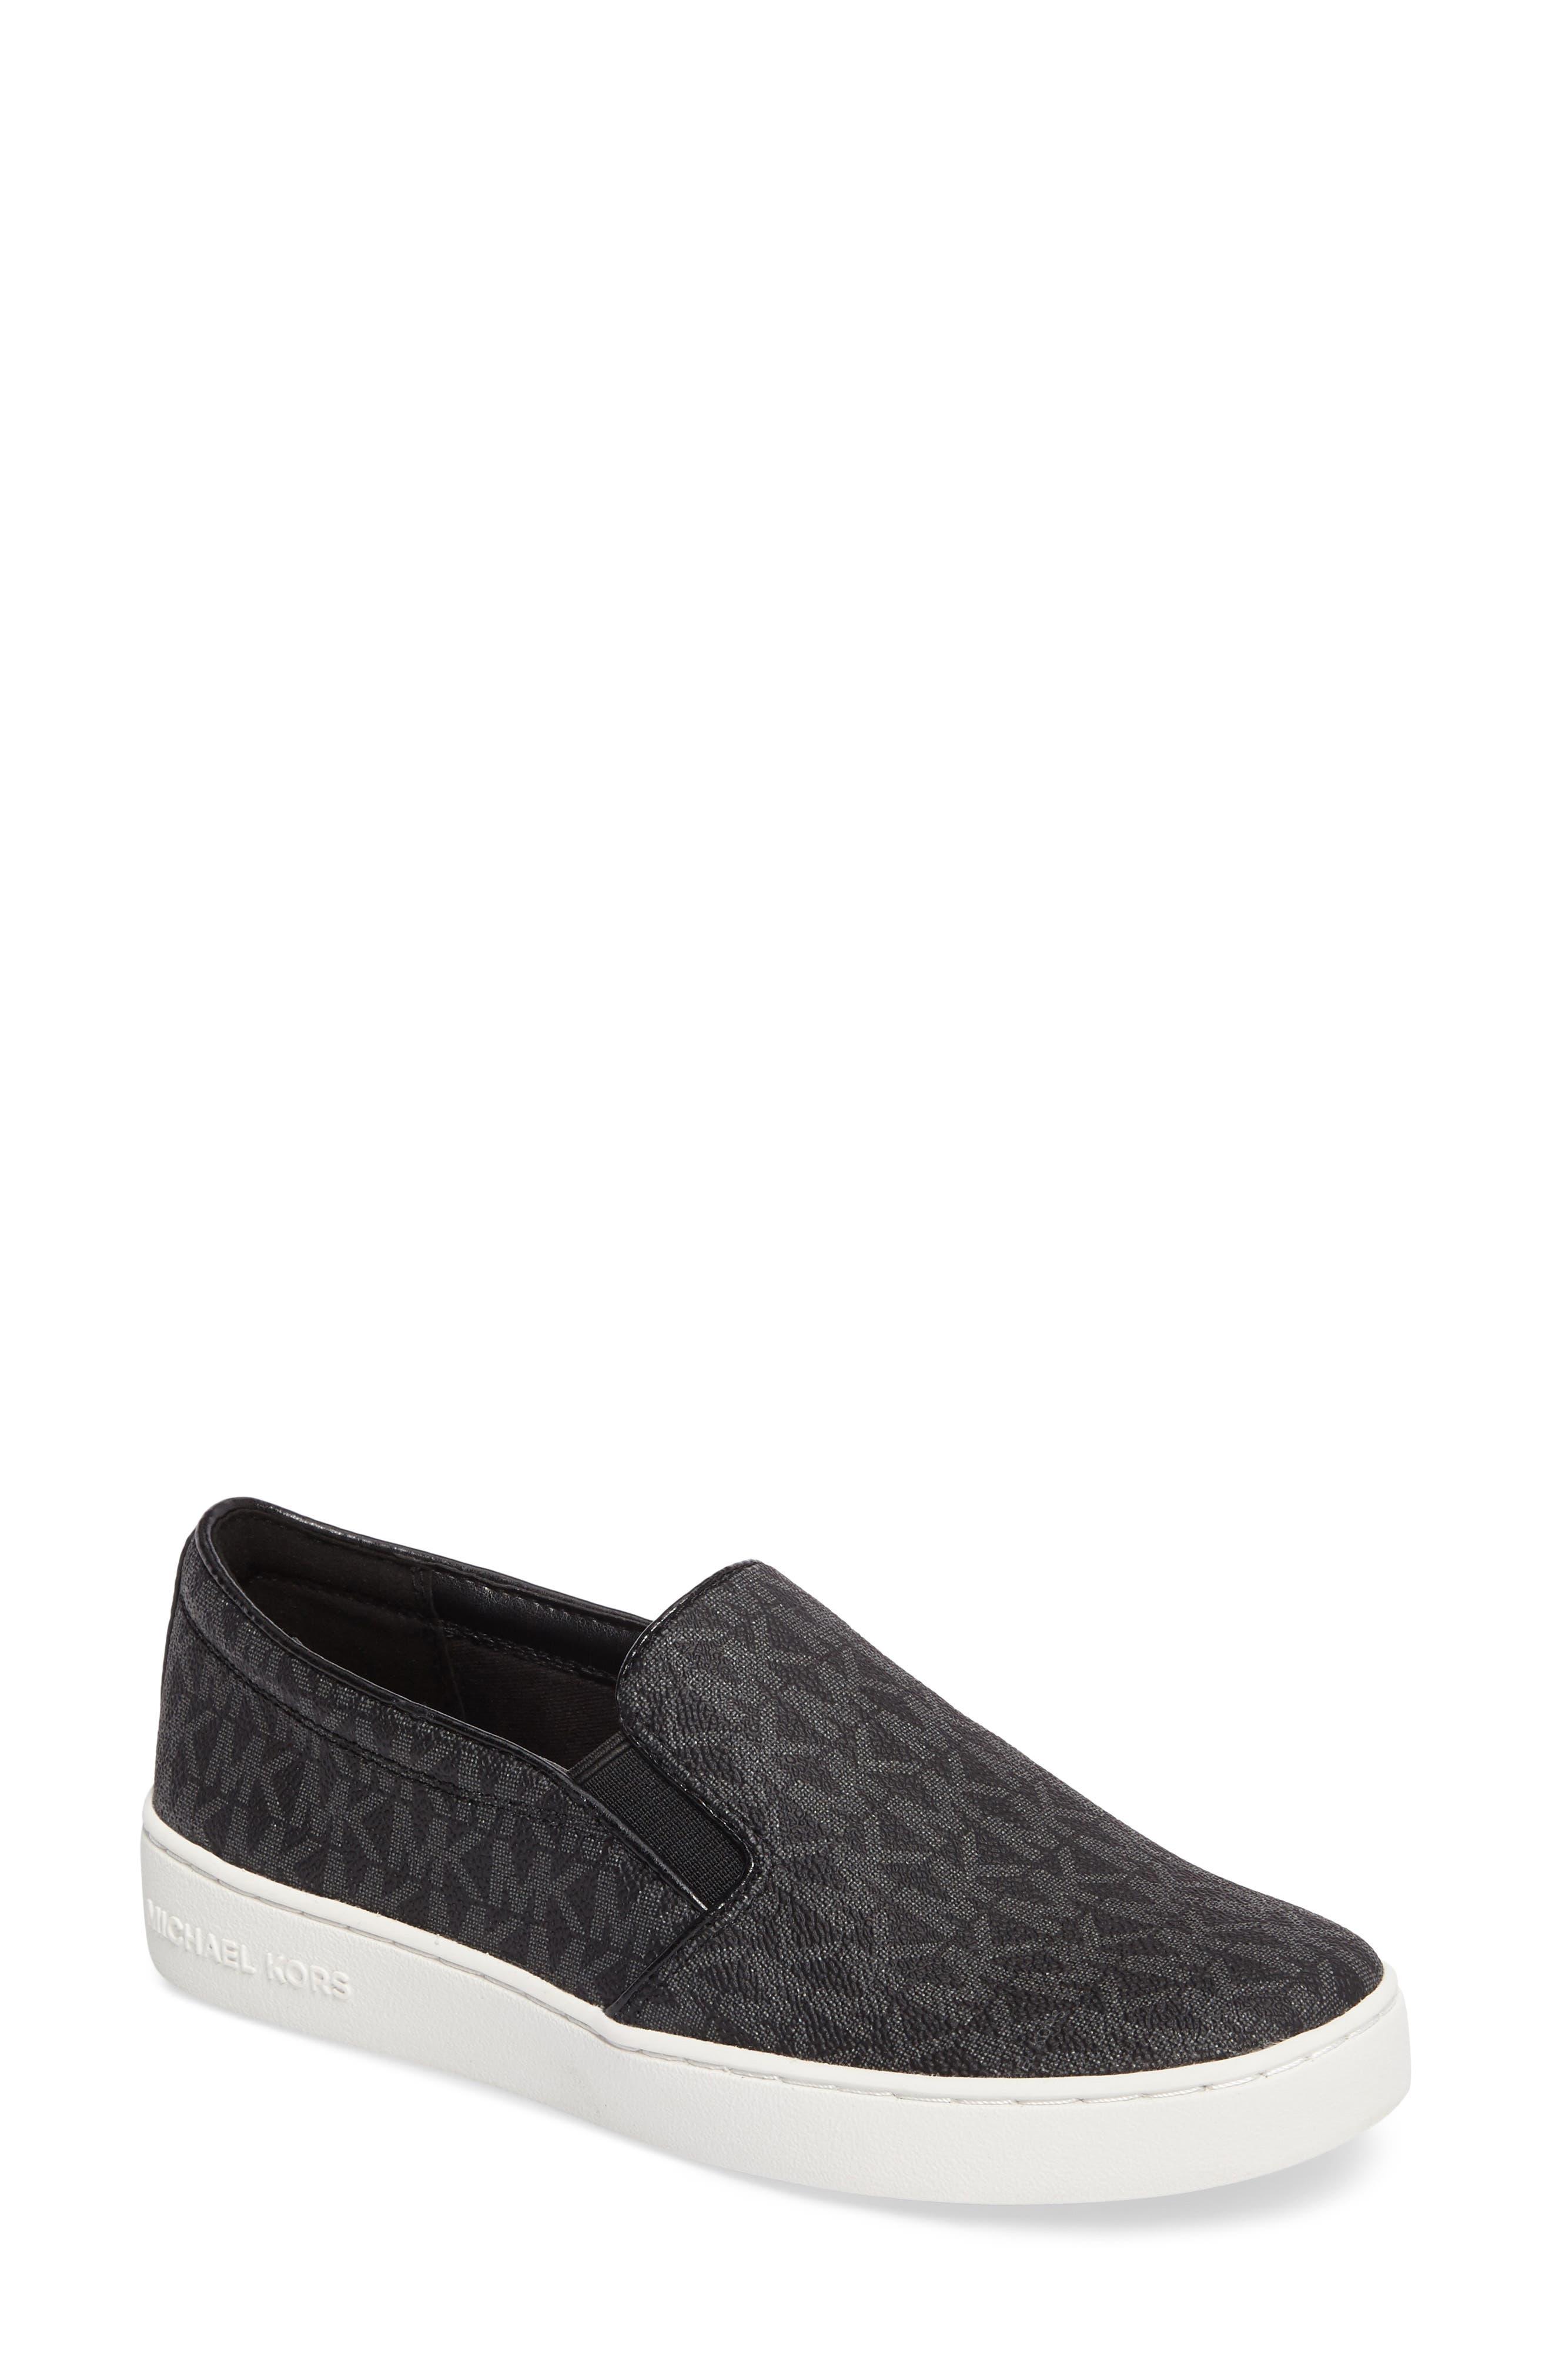 8f3dbbd331b30 Women s MICHAEL Michael Kors Shoes